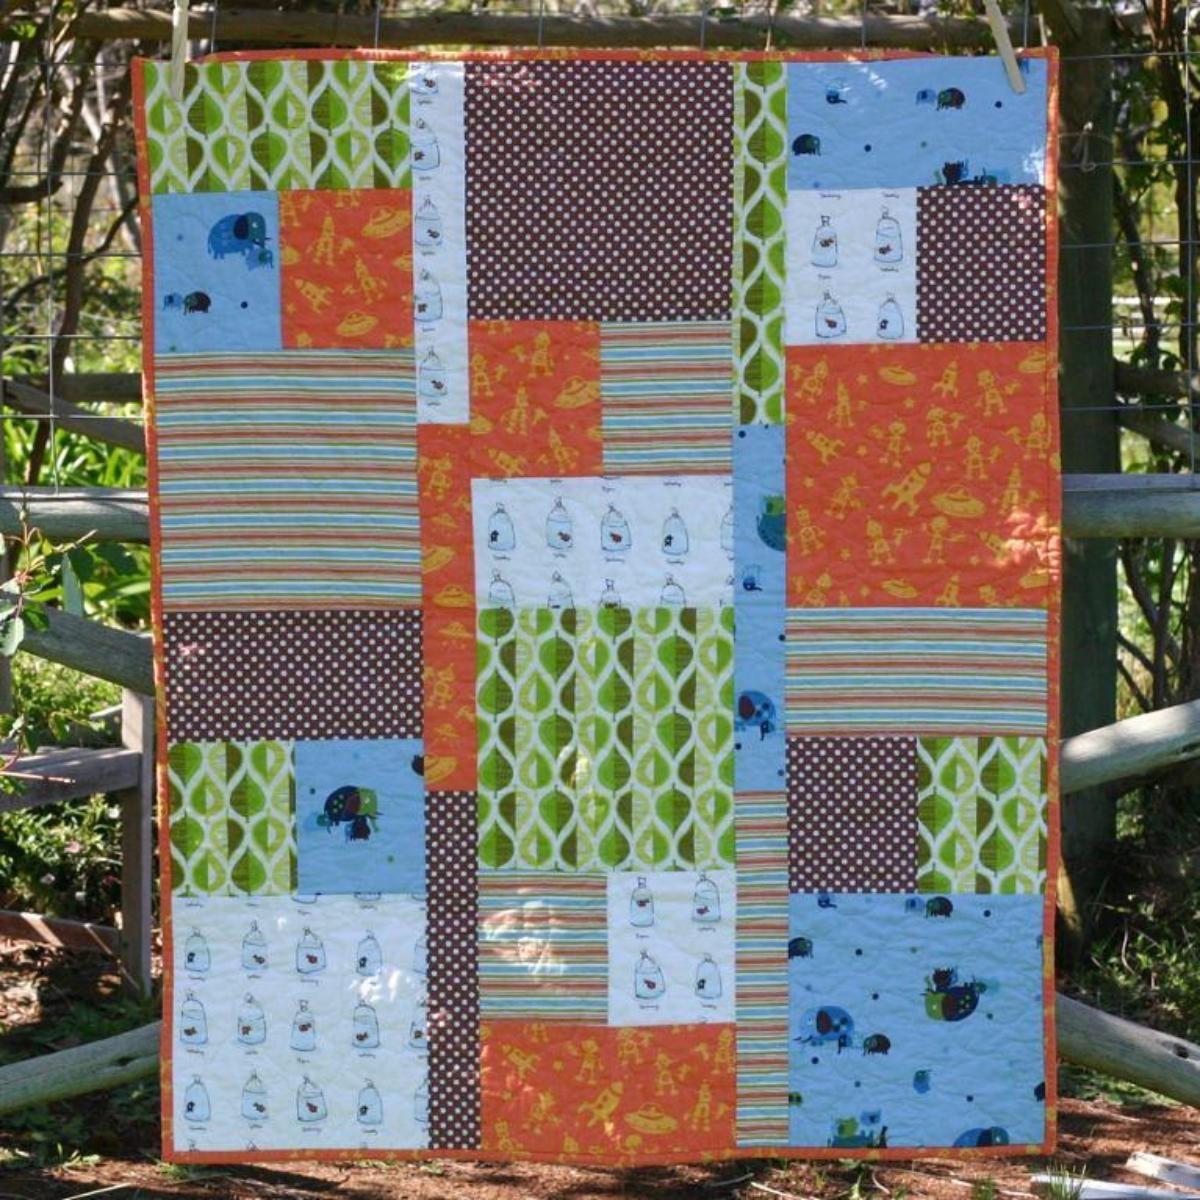 Easy Fat Quarter Quilt | Quilt patterns | Pinterest | Fat quarter ... : easy fat quarter quilt - Adamdwight.com